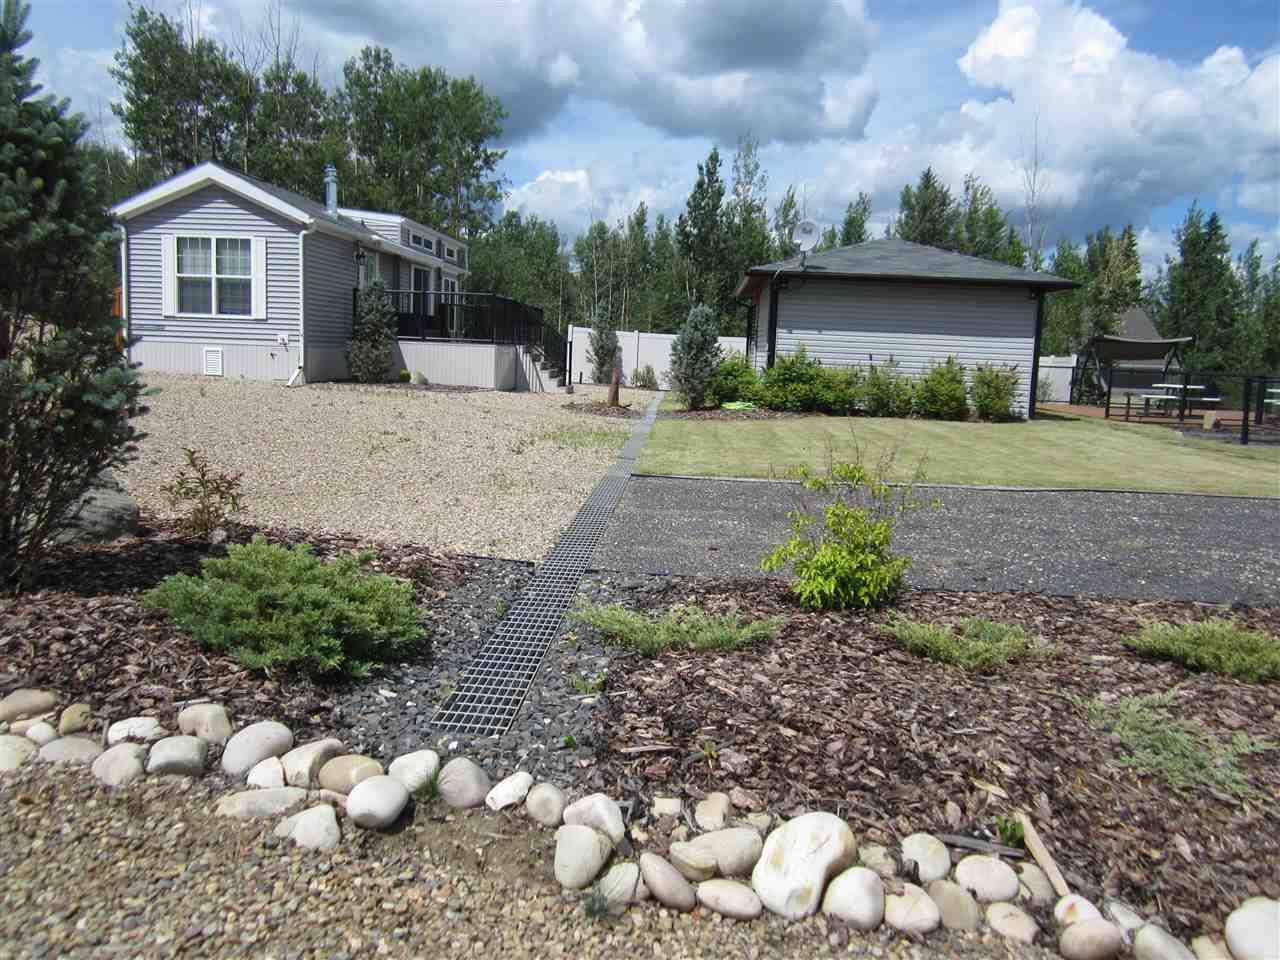 Main Photo: 604, 605 60501 Range Rd 120: Rural St. Paul County House for sale : MLS®# E4089584